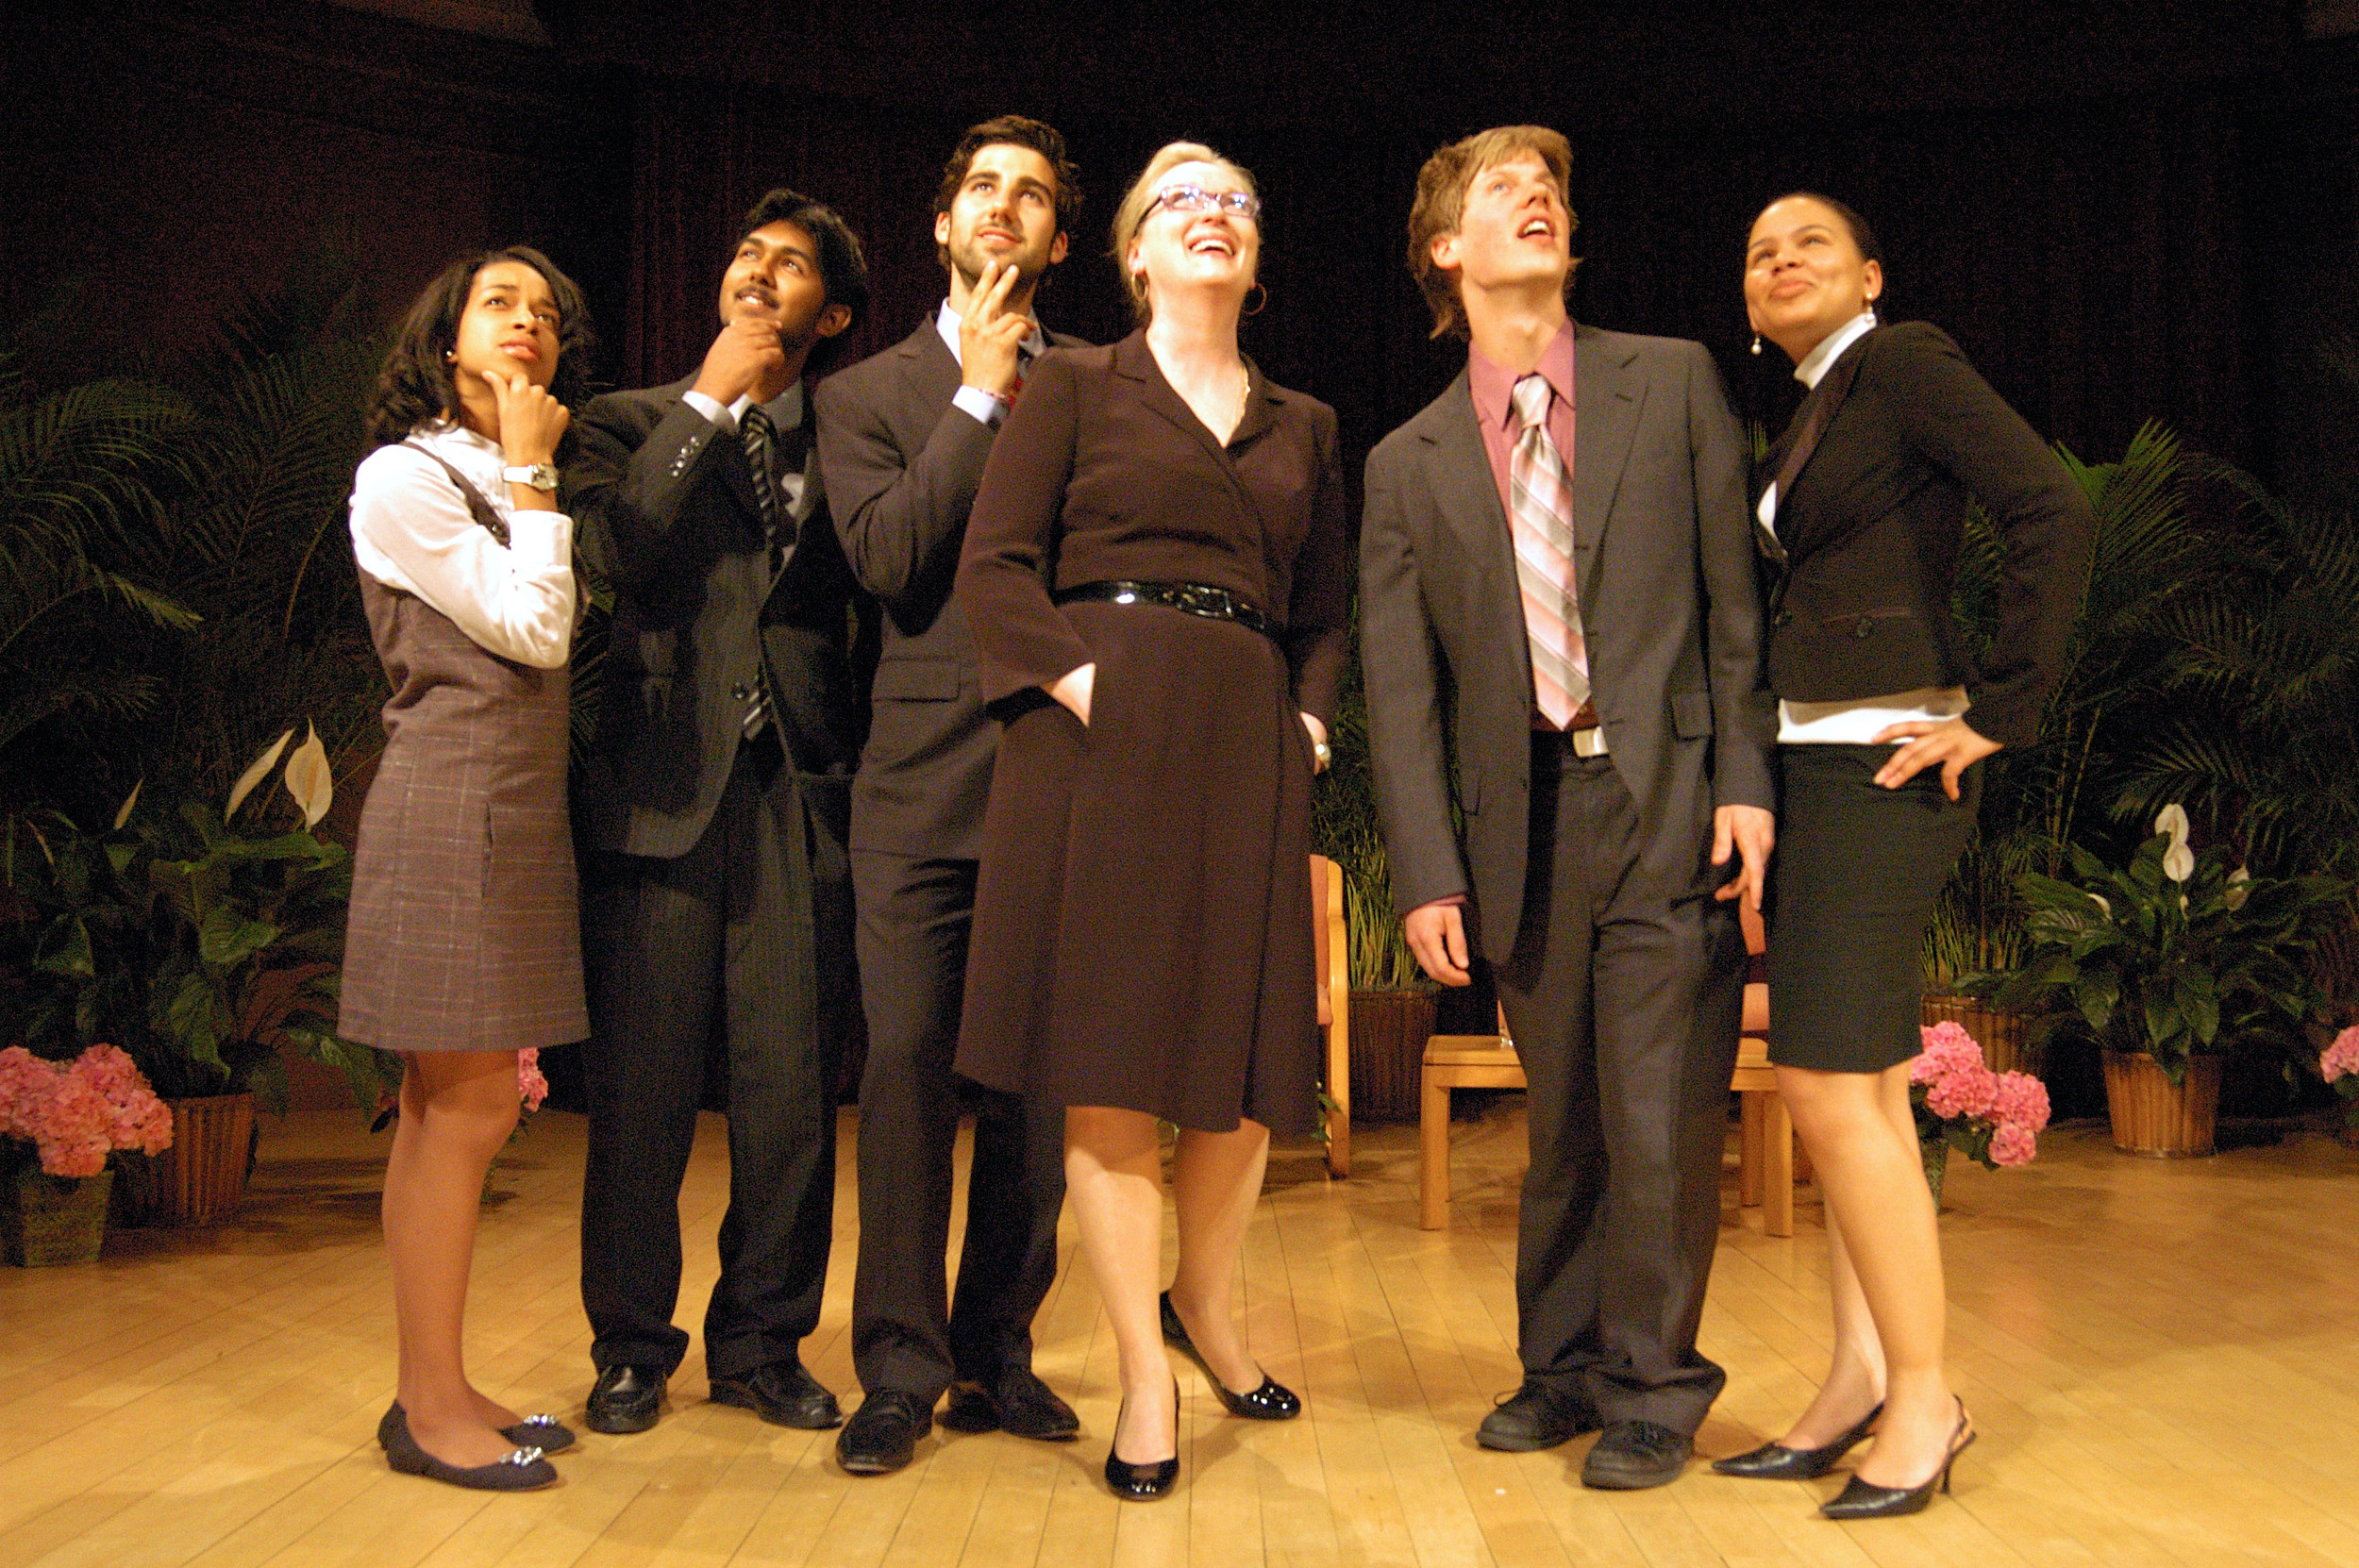 Meryl Streep with the 2008 Legacy Winners: Chelsea Harrison, Ayon Sen, Mickey Ashmore, Luke Jensen, and Sarah Lockridge-Steckel